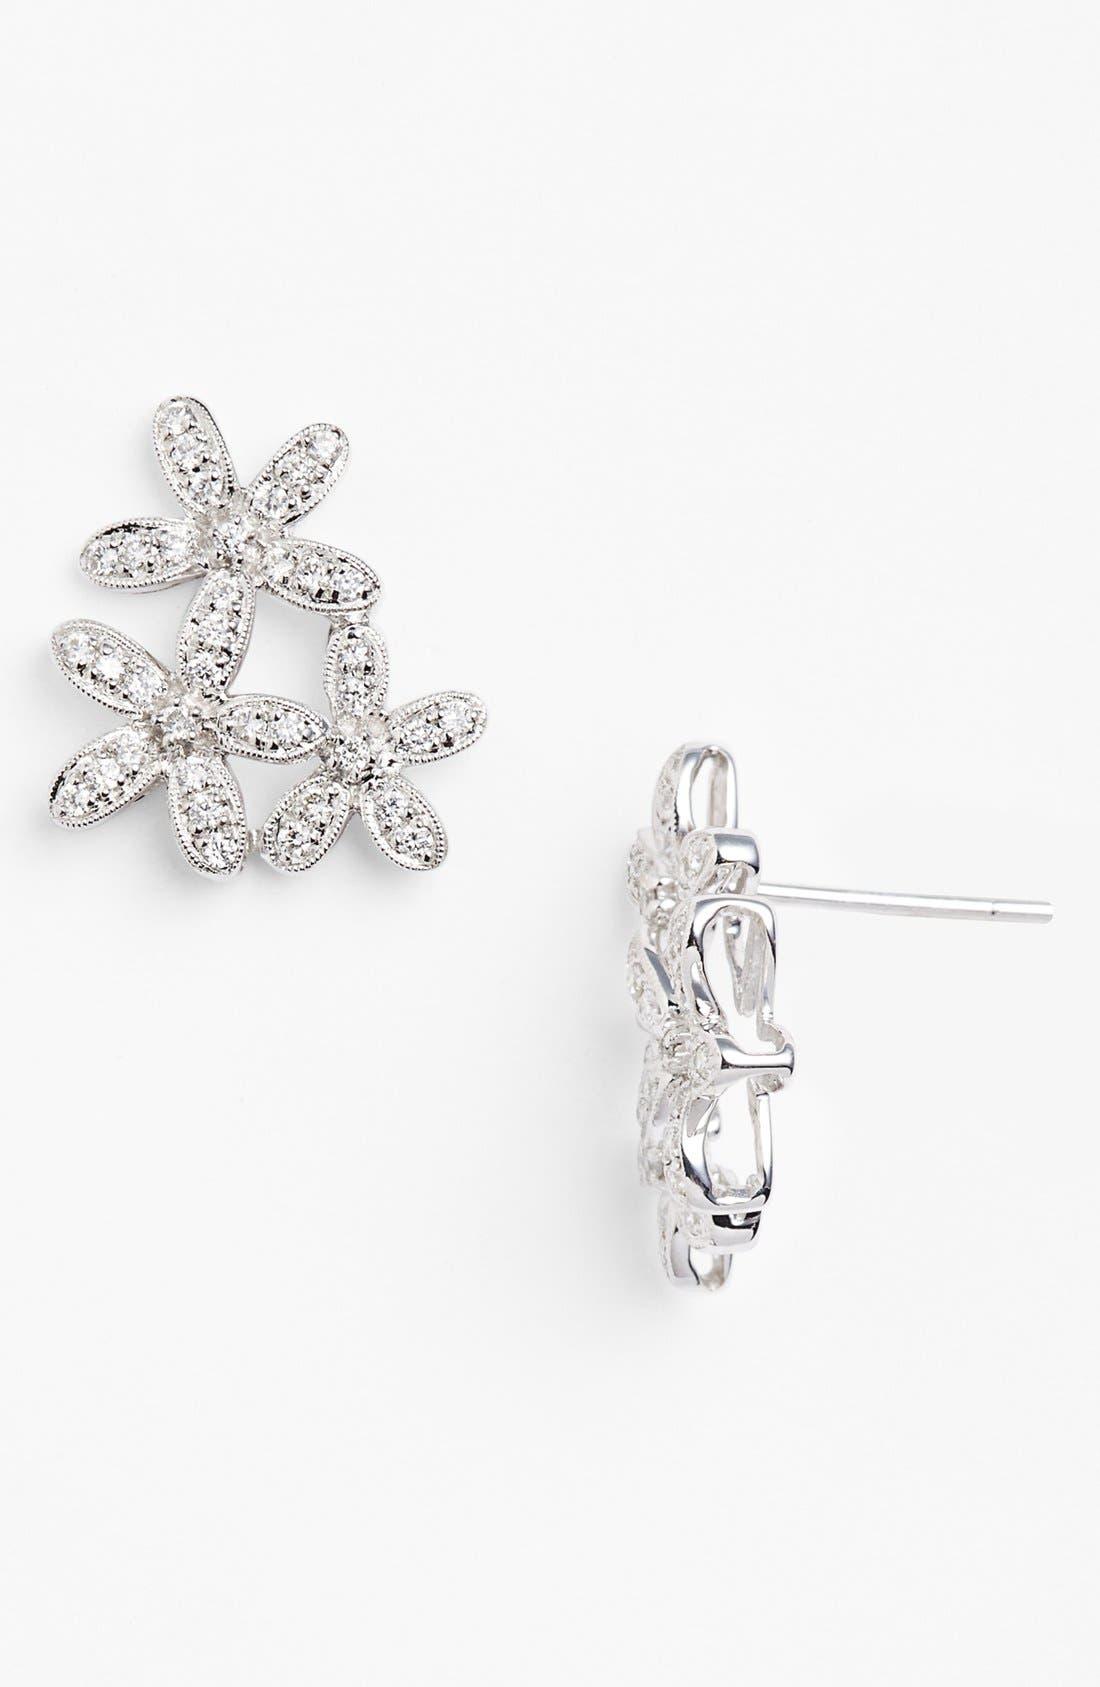 Alternate Image 1 Selected - Dana Rebecca Designs 'Agnes Fortune' Diamond Flower Stud Earrings